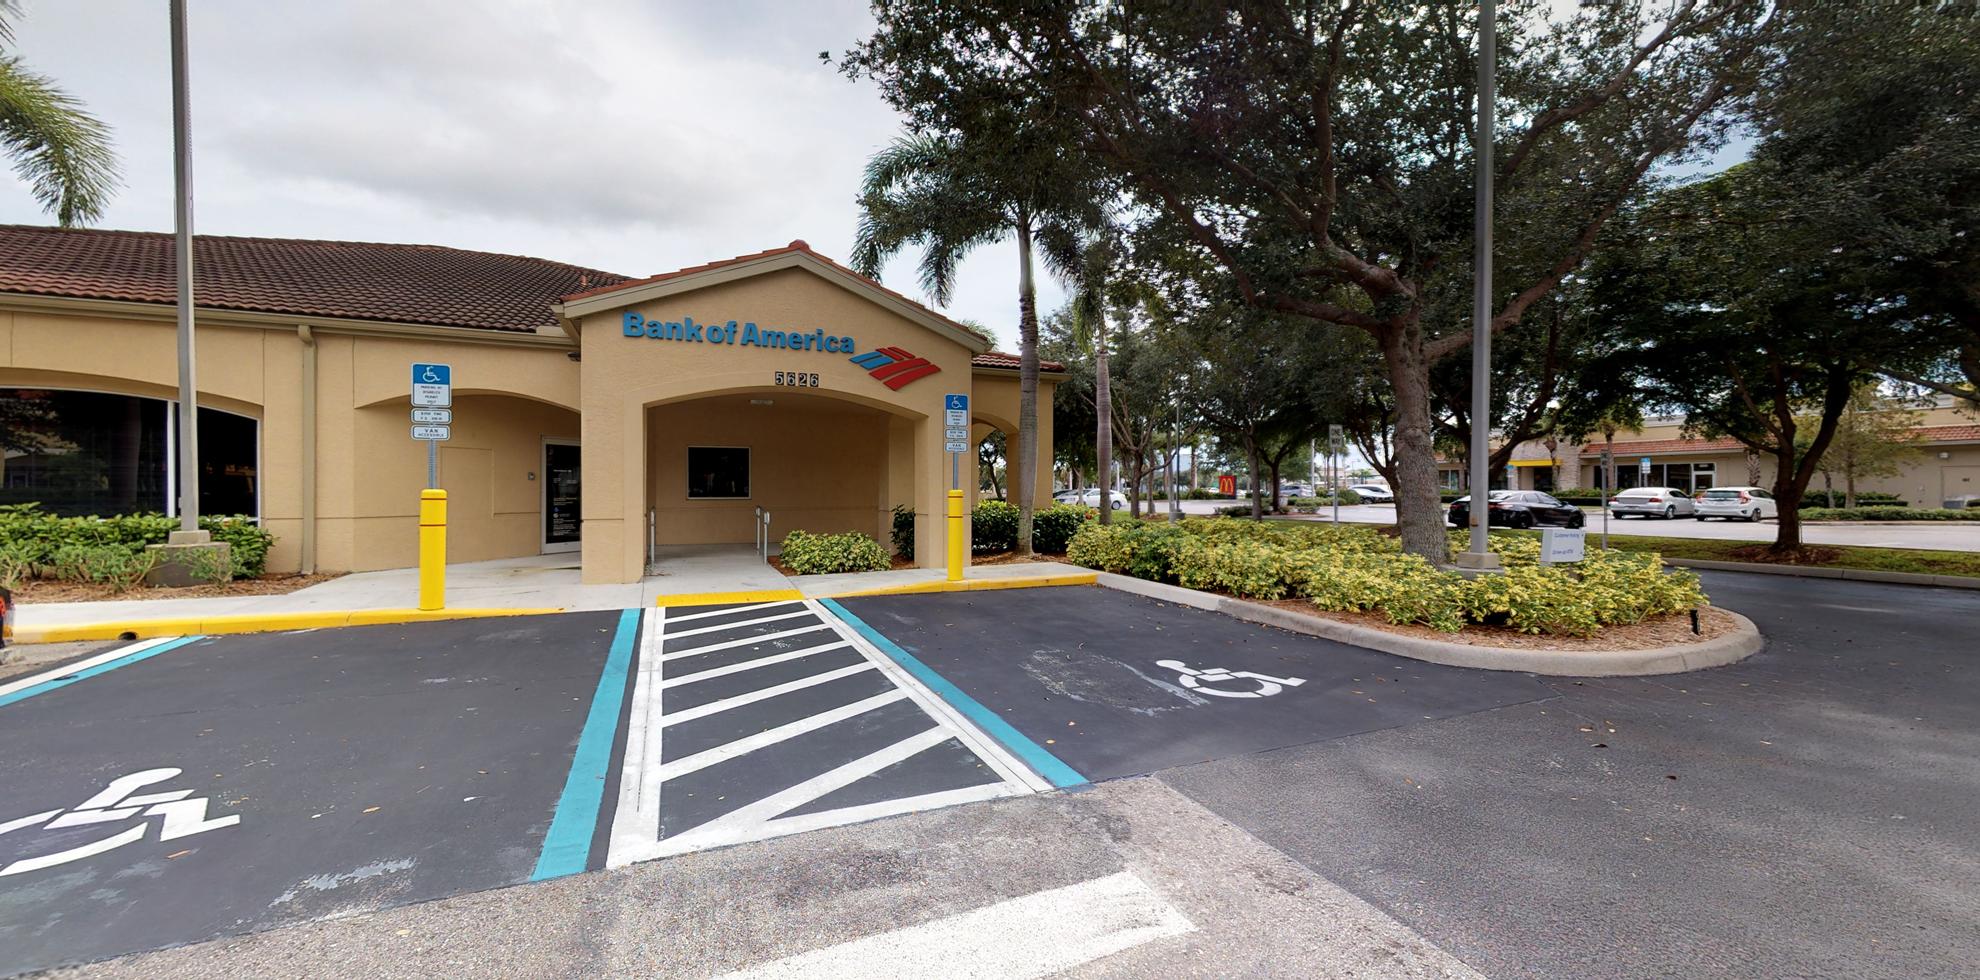 Bank of America financial center with drive-thru ATM | 5626 Tavilla Cir, Naples, FL 34110